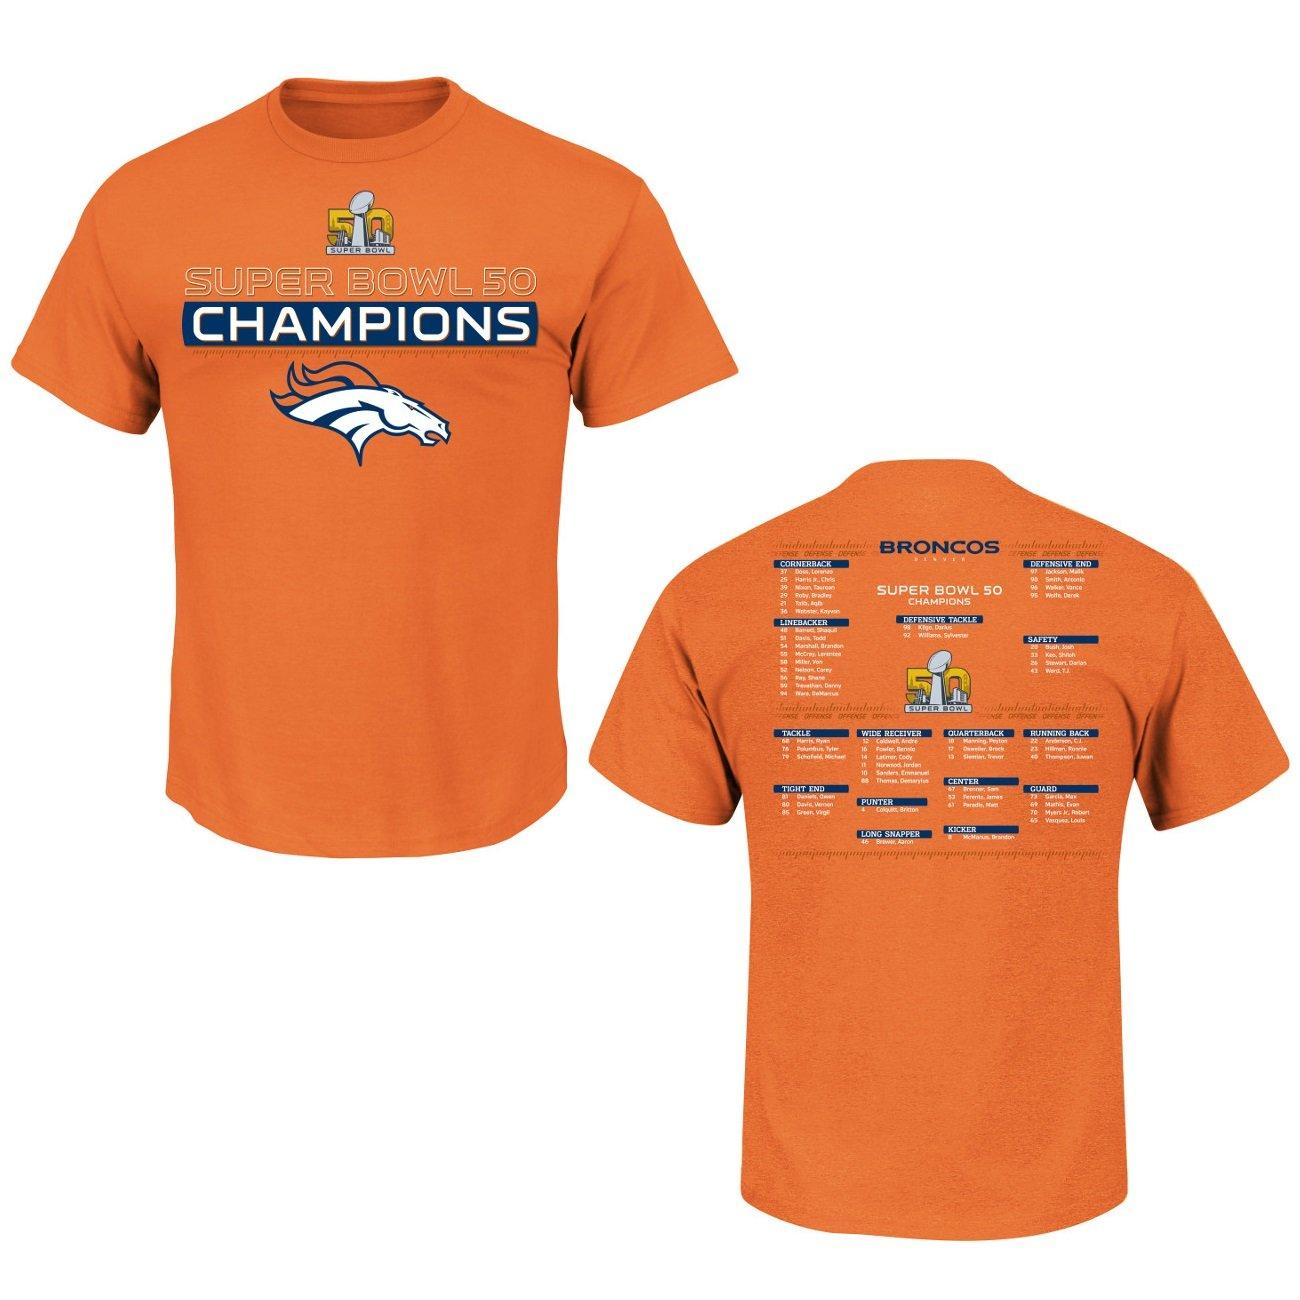 402e4193 Denver Broncos Super Bowl 50 Champs Championship Way Orange T-shirt